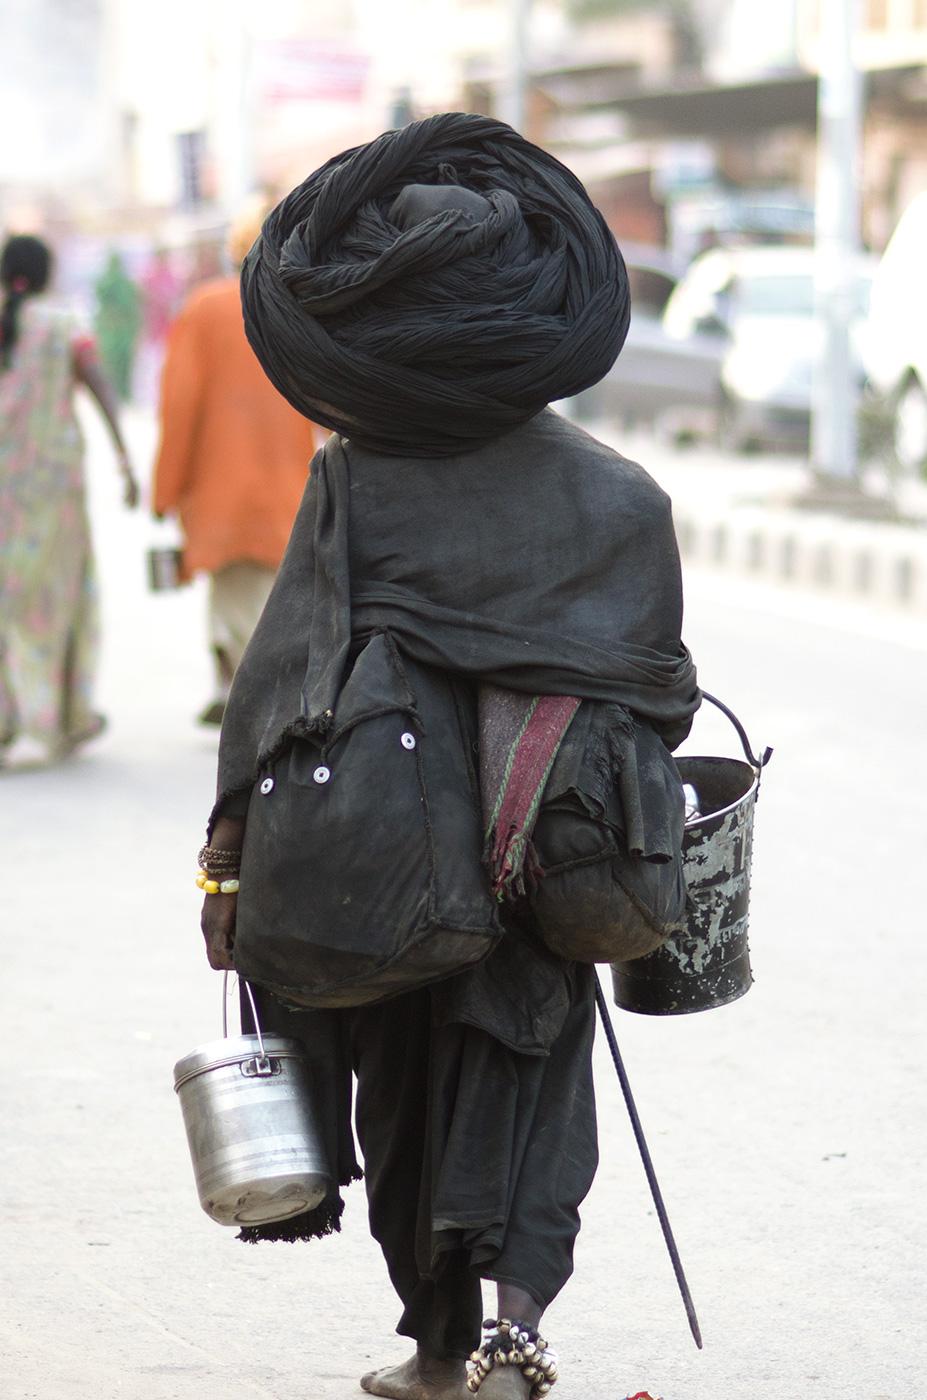 © Wearabout, Mumbai, India